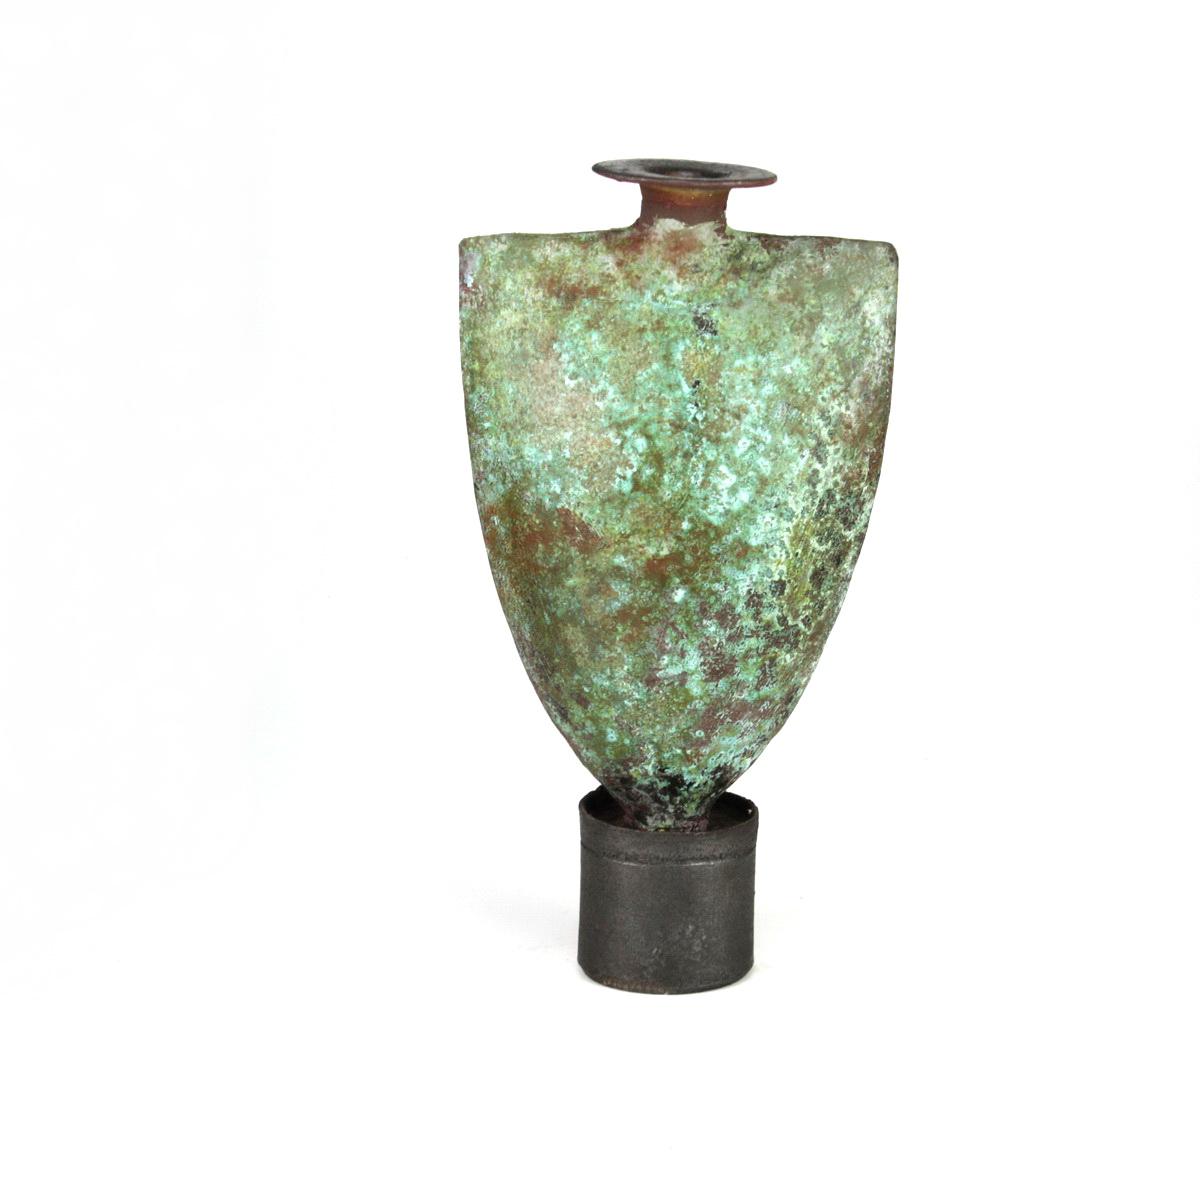 john-bedding-ceramic-pot-c118